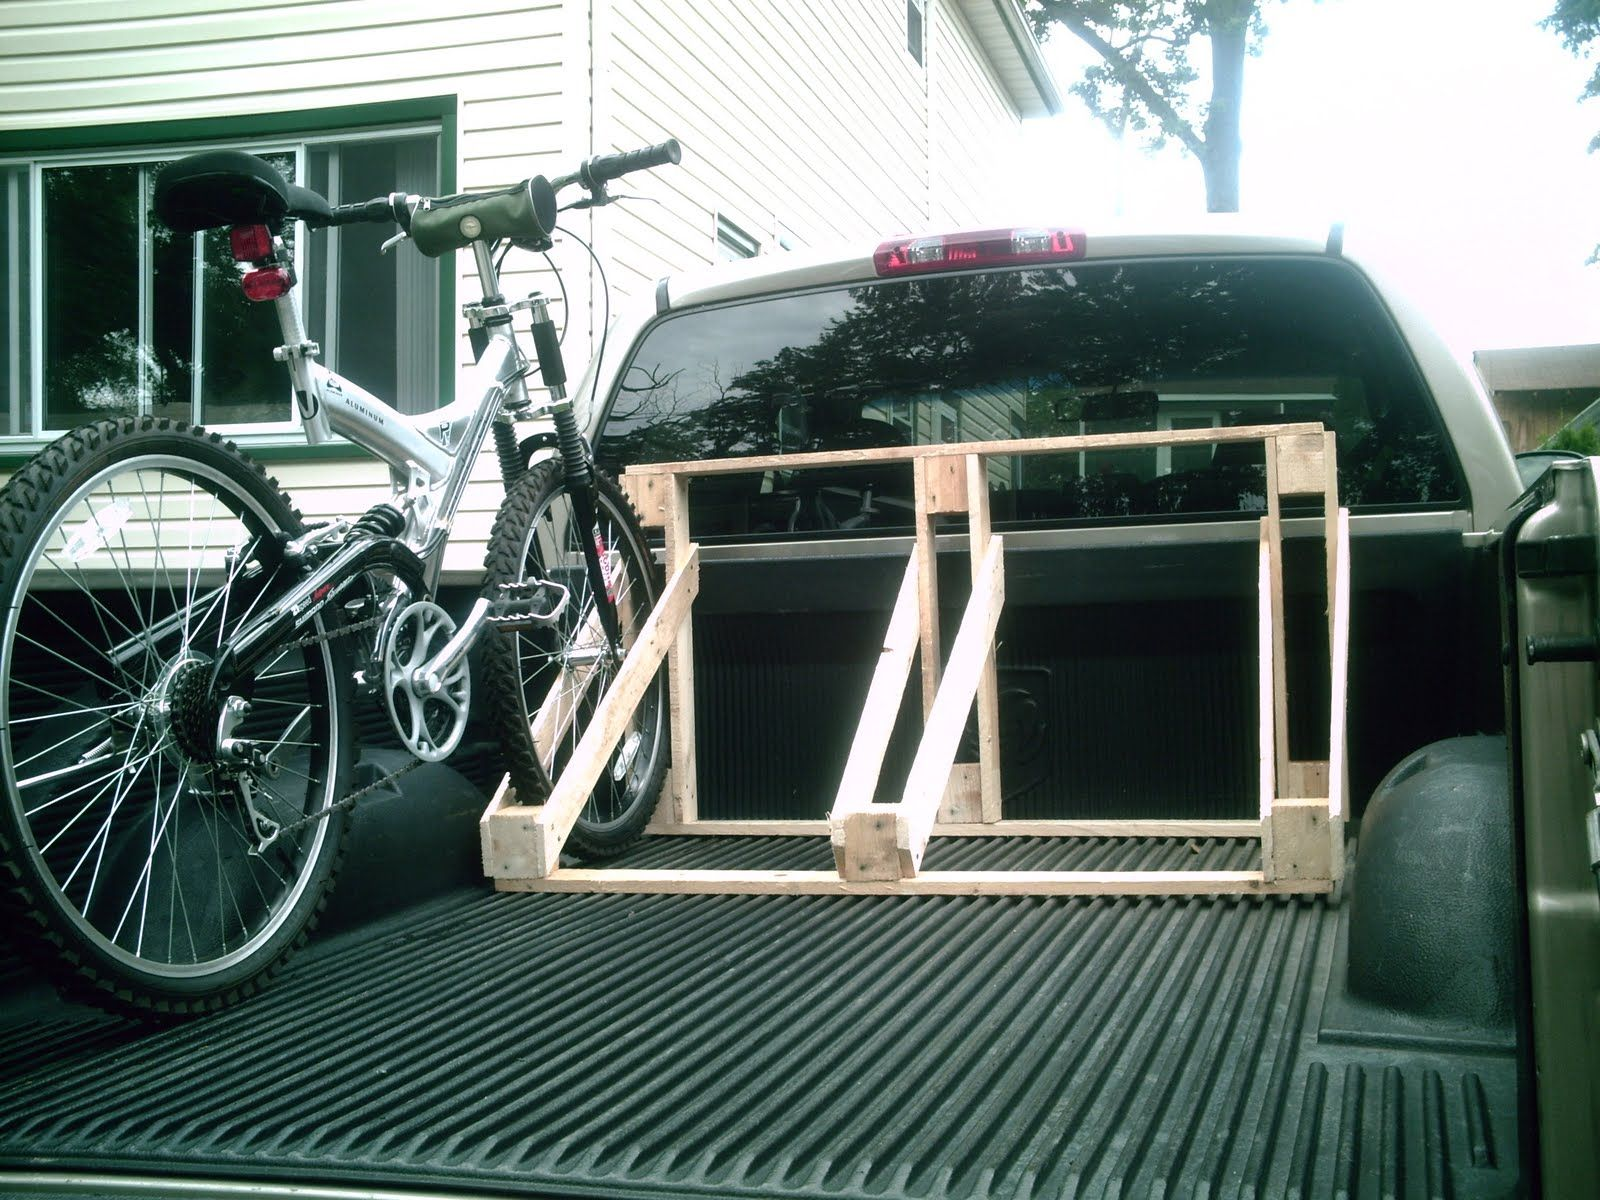 multisport bike mount org sherpa gun gunmetal products racks rack orgmm hitch metal kuat tribe